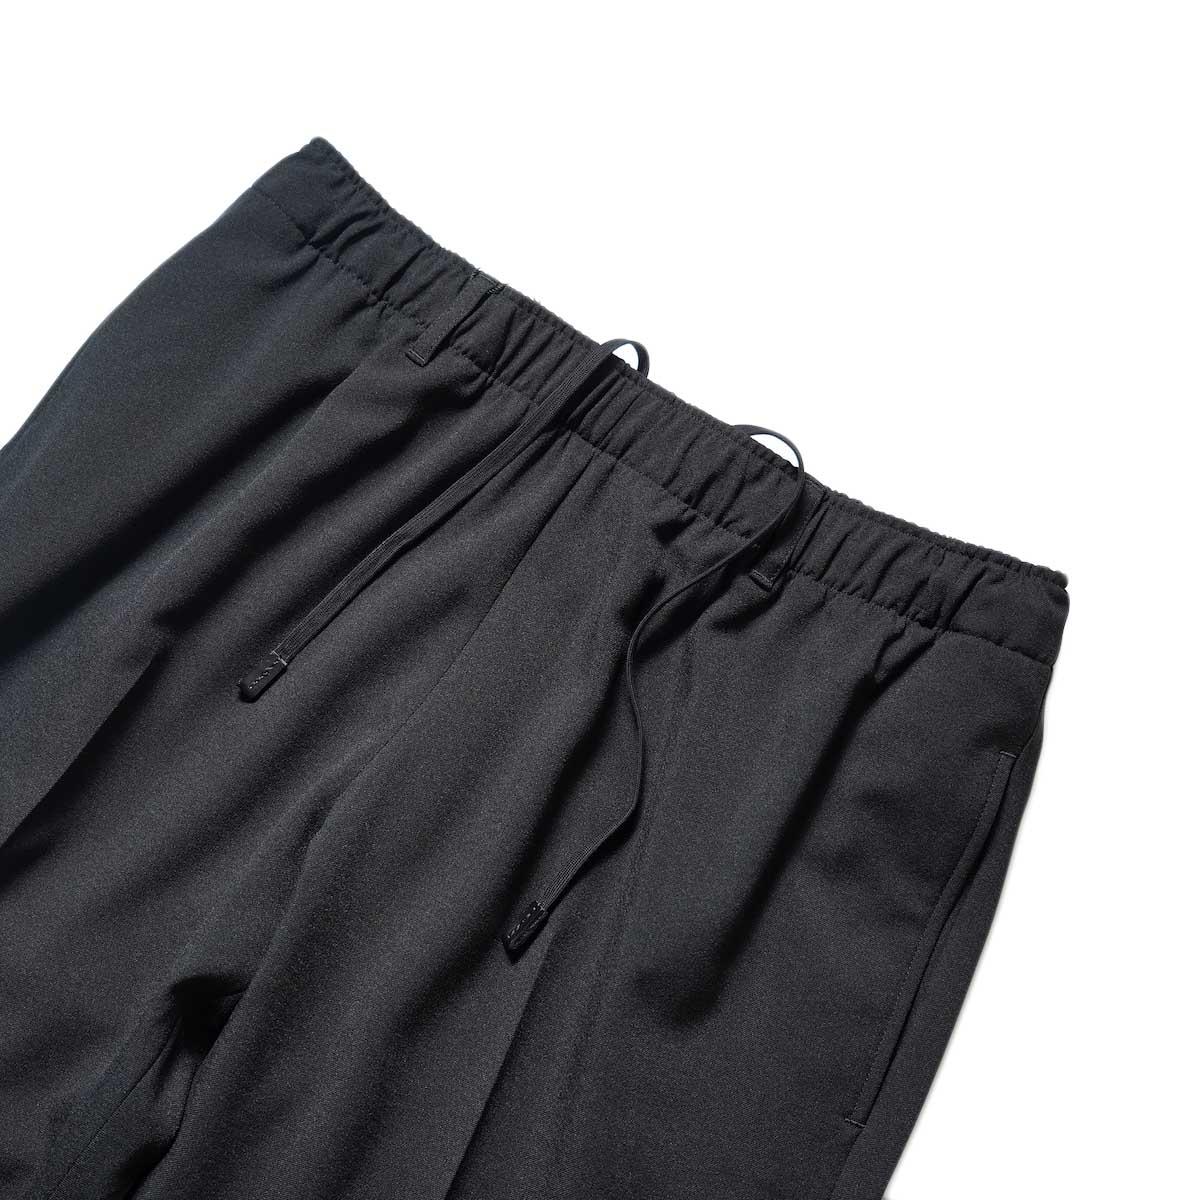 N.HOOLYWOOD / 2212-CP07-008 peg Tapered Easy Pants (Blackウエスト